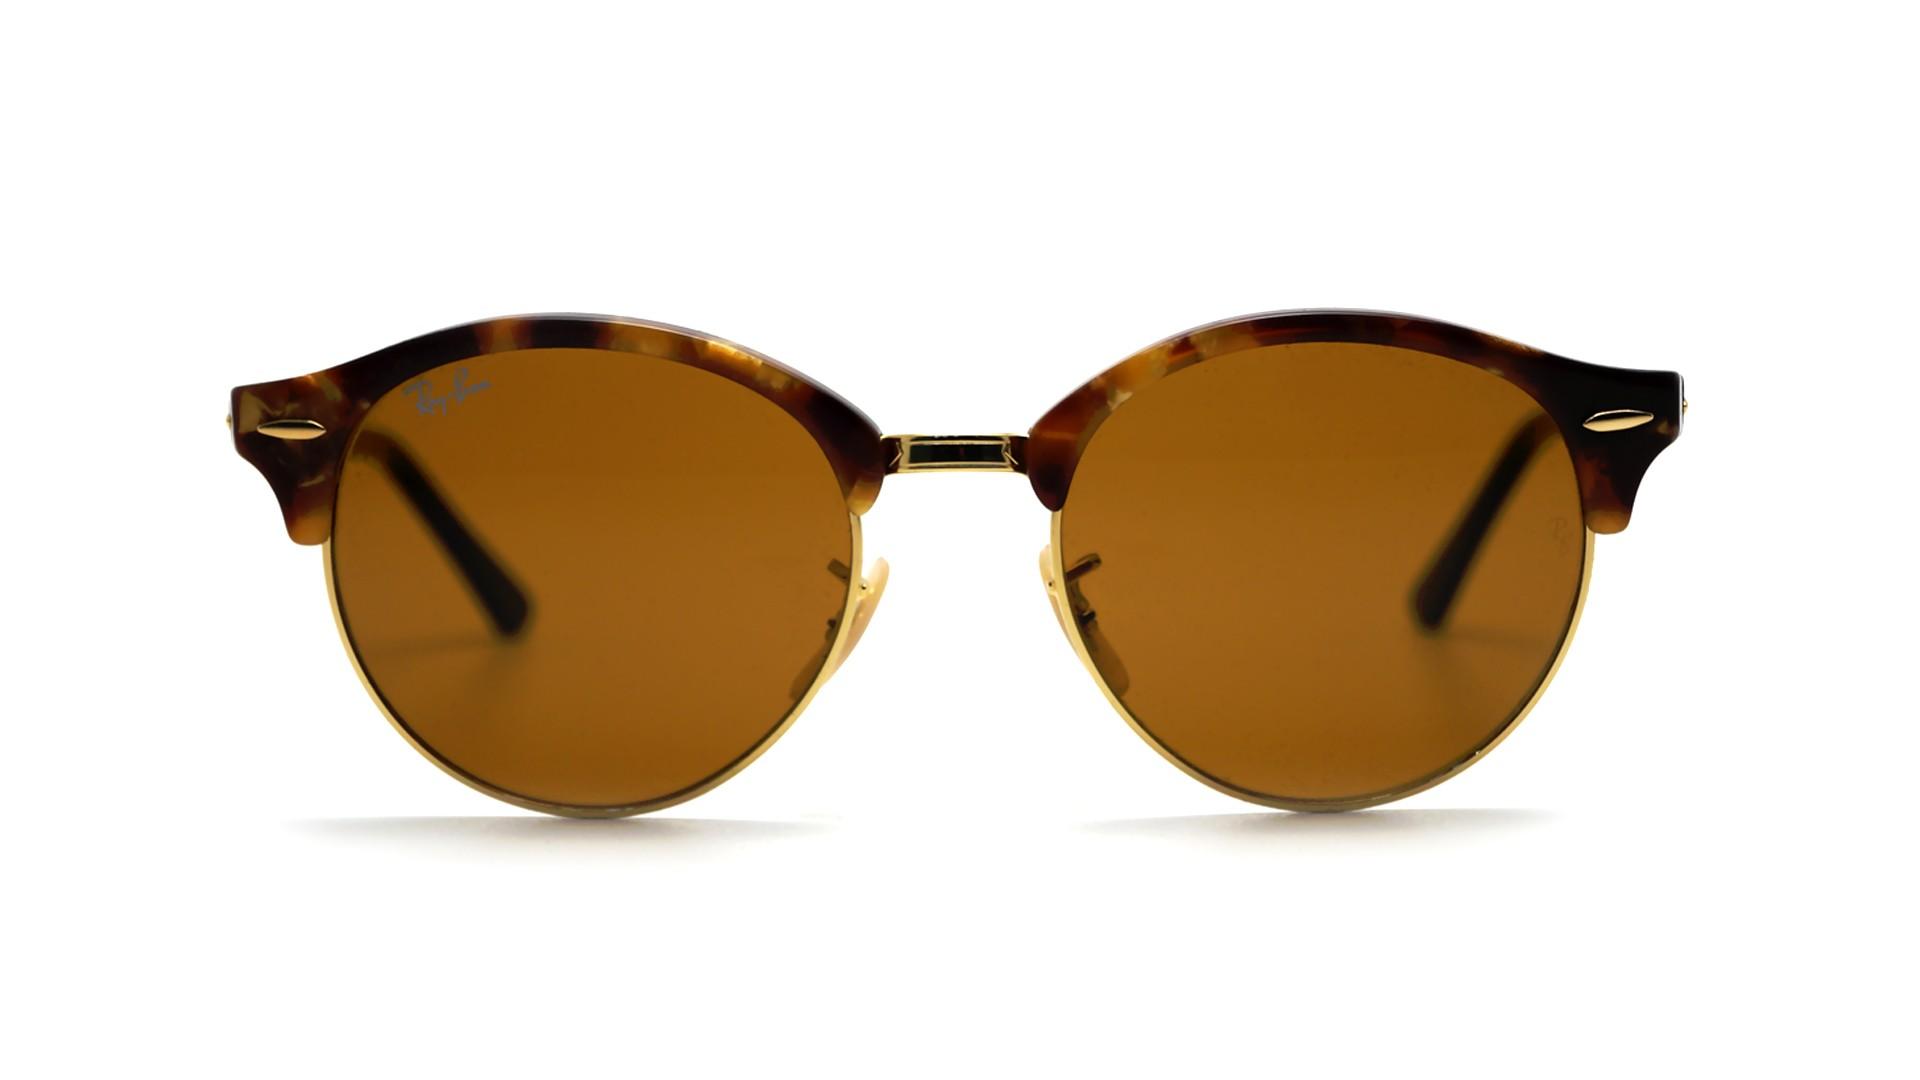 c1f468a35e9 Sunglasses Ray-Ban Clubround Tortoise B-15 RB4246 1160 51-19 Medium